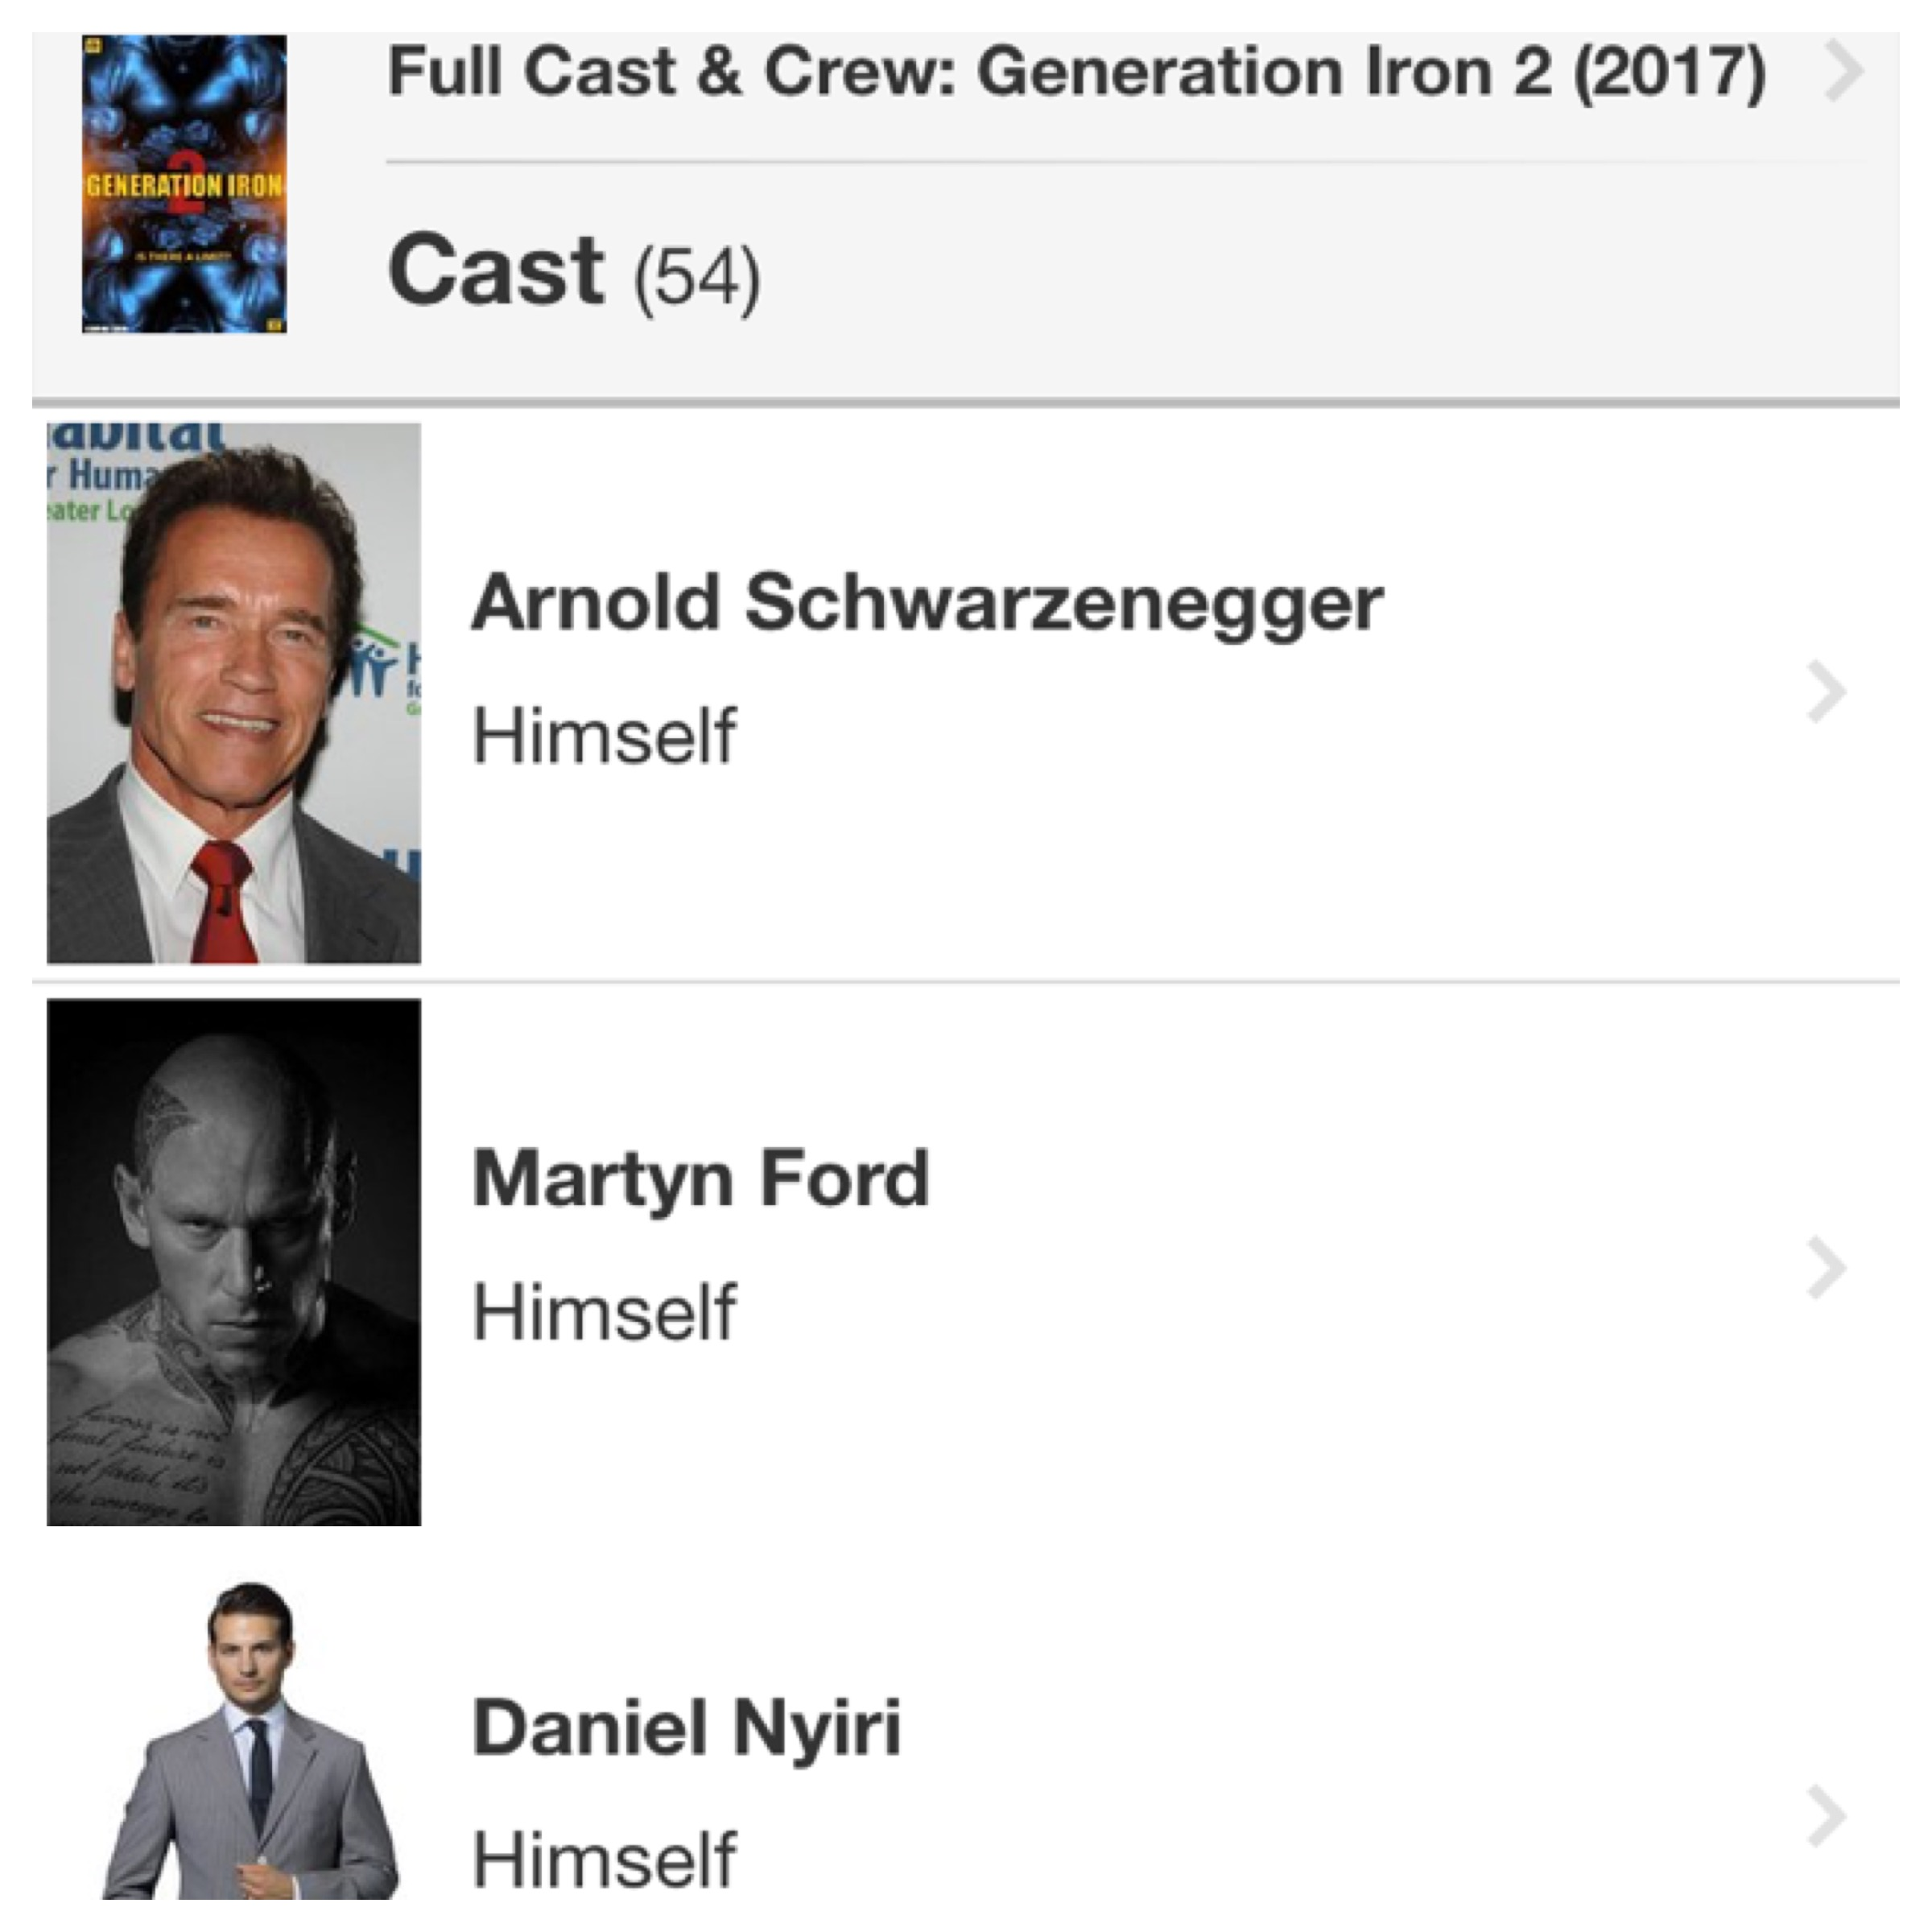 Daniel Nyiri in Generation Iron 2 movie